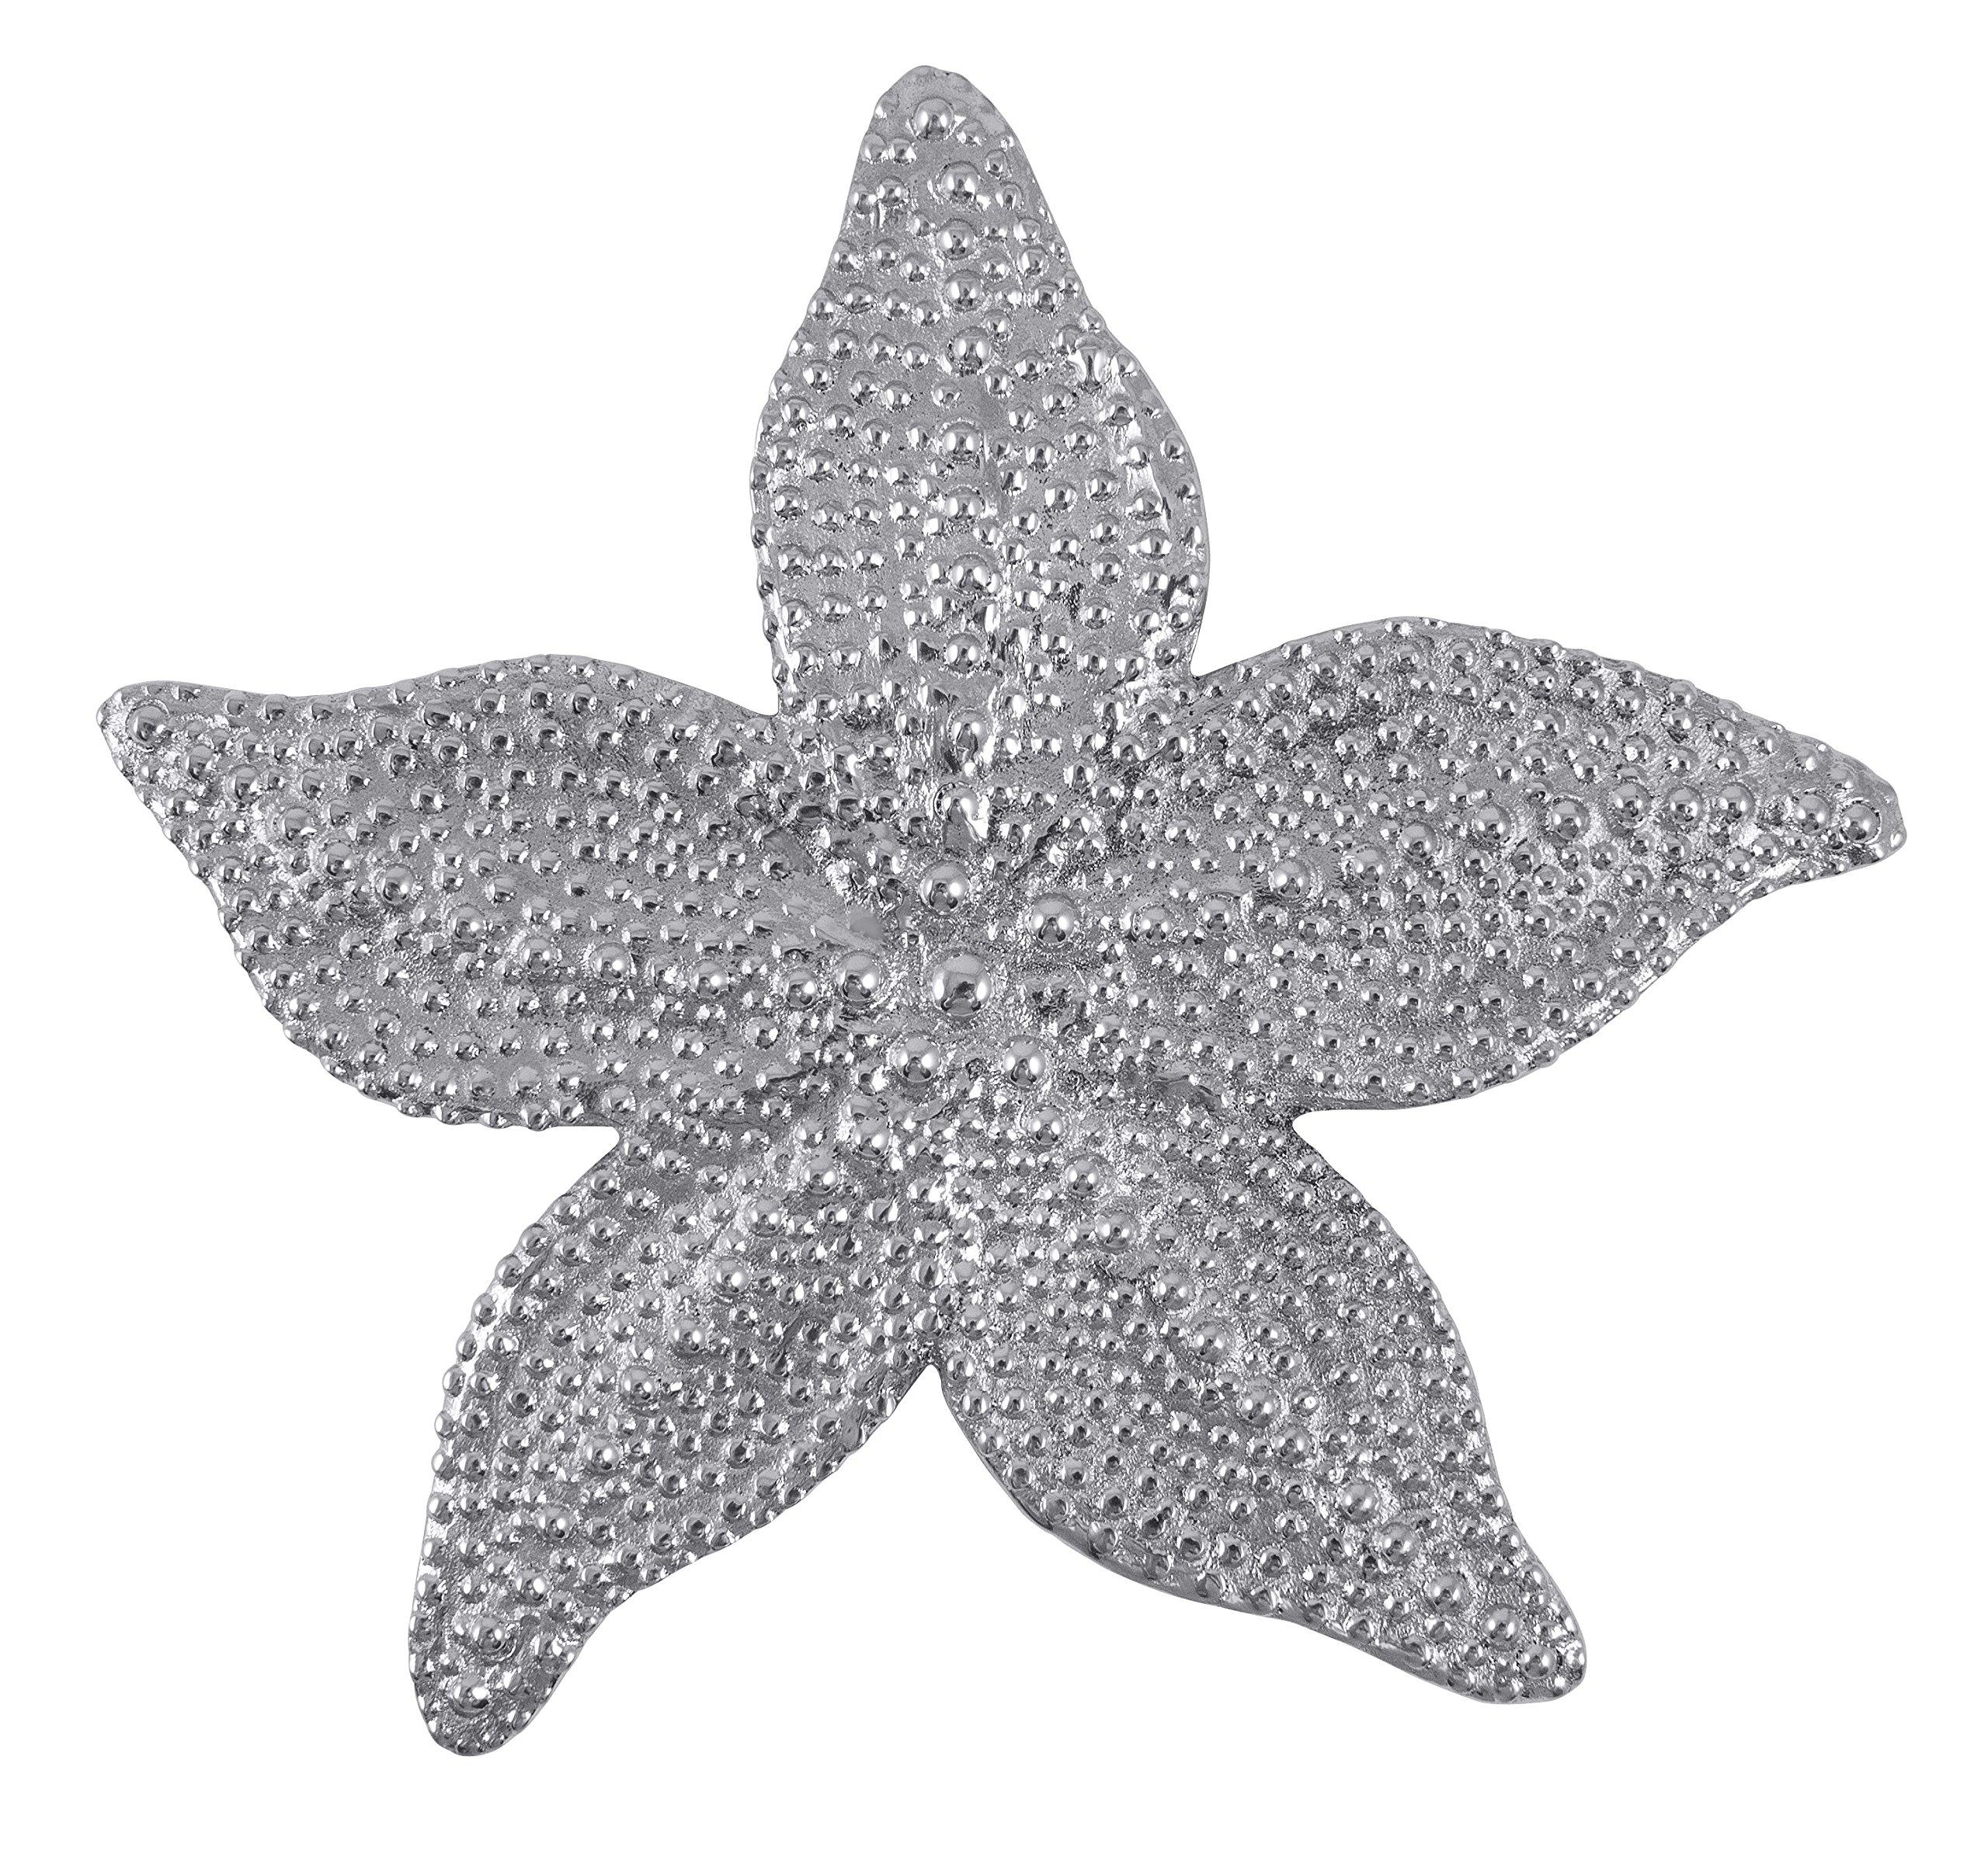 Mariposa Starfish Trivet by MARIPOSA